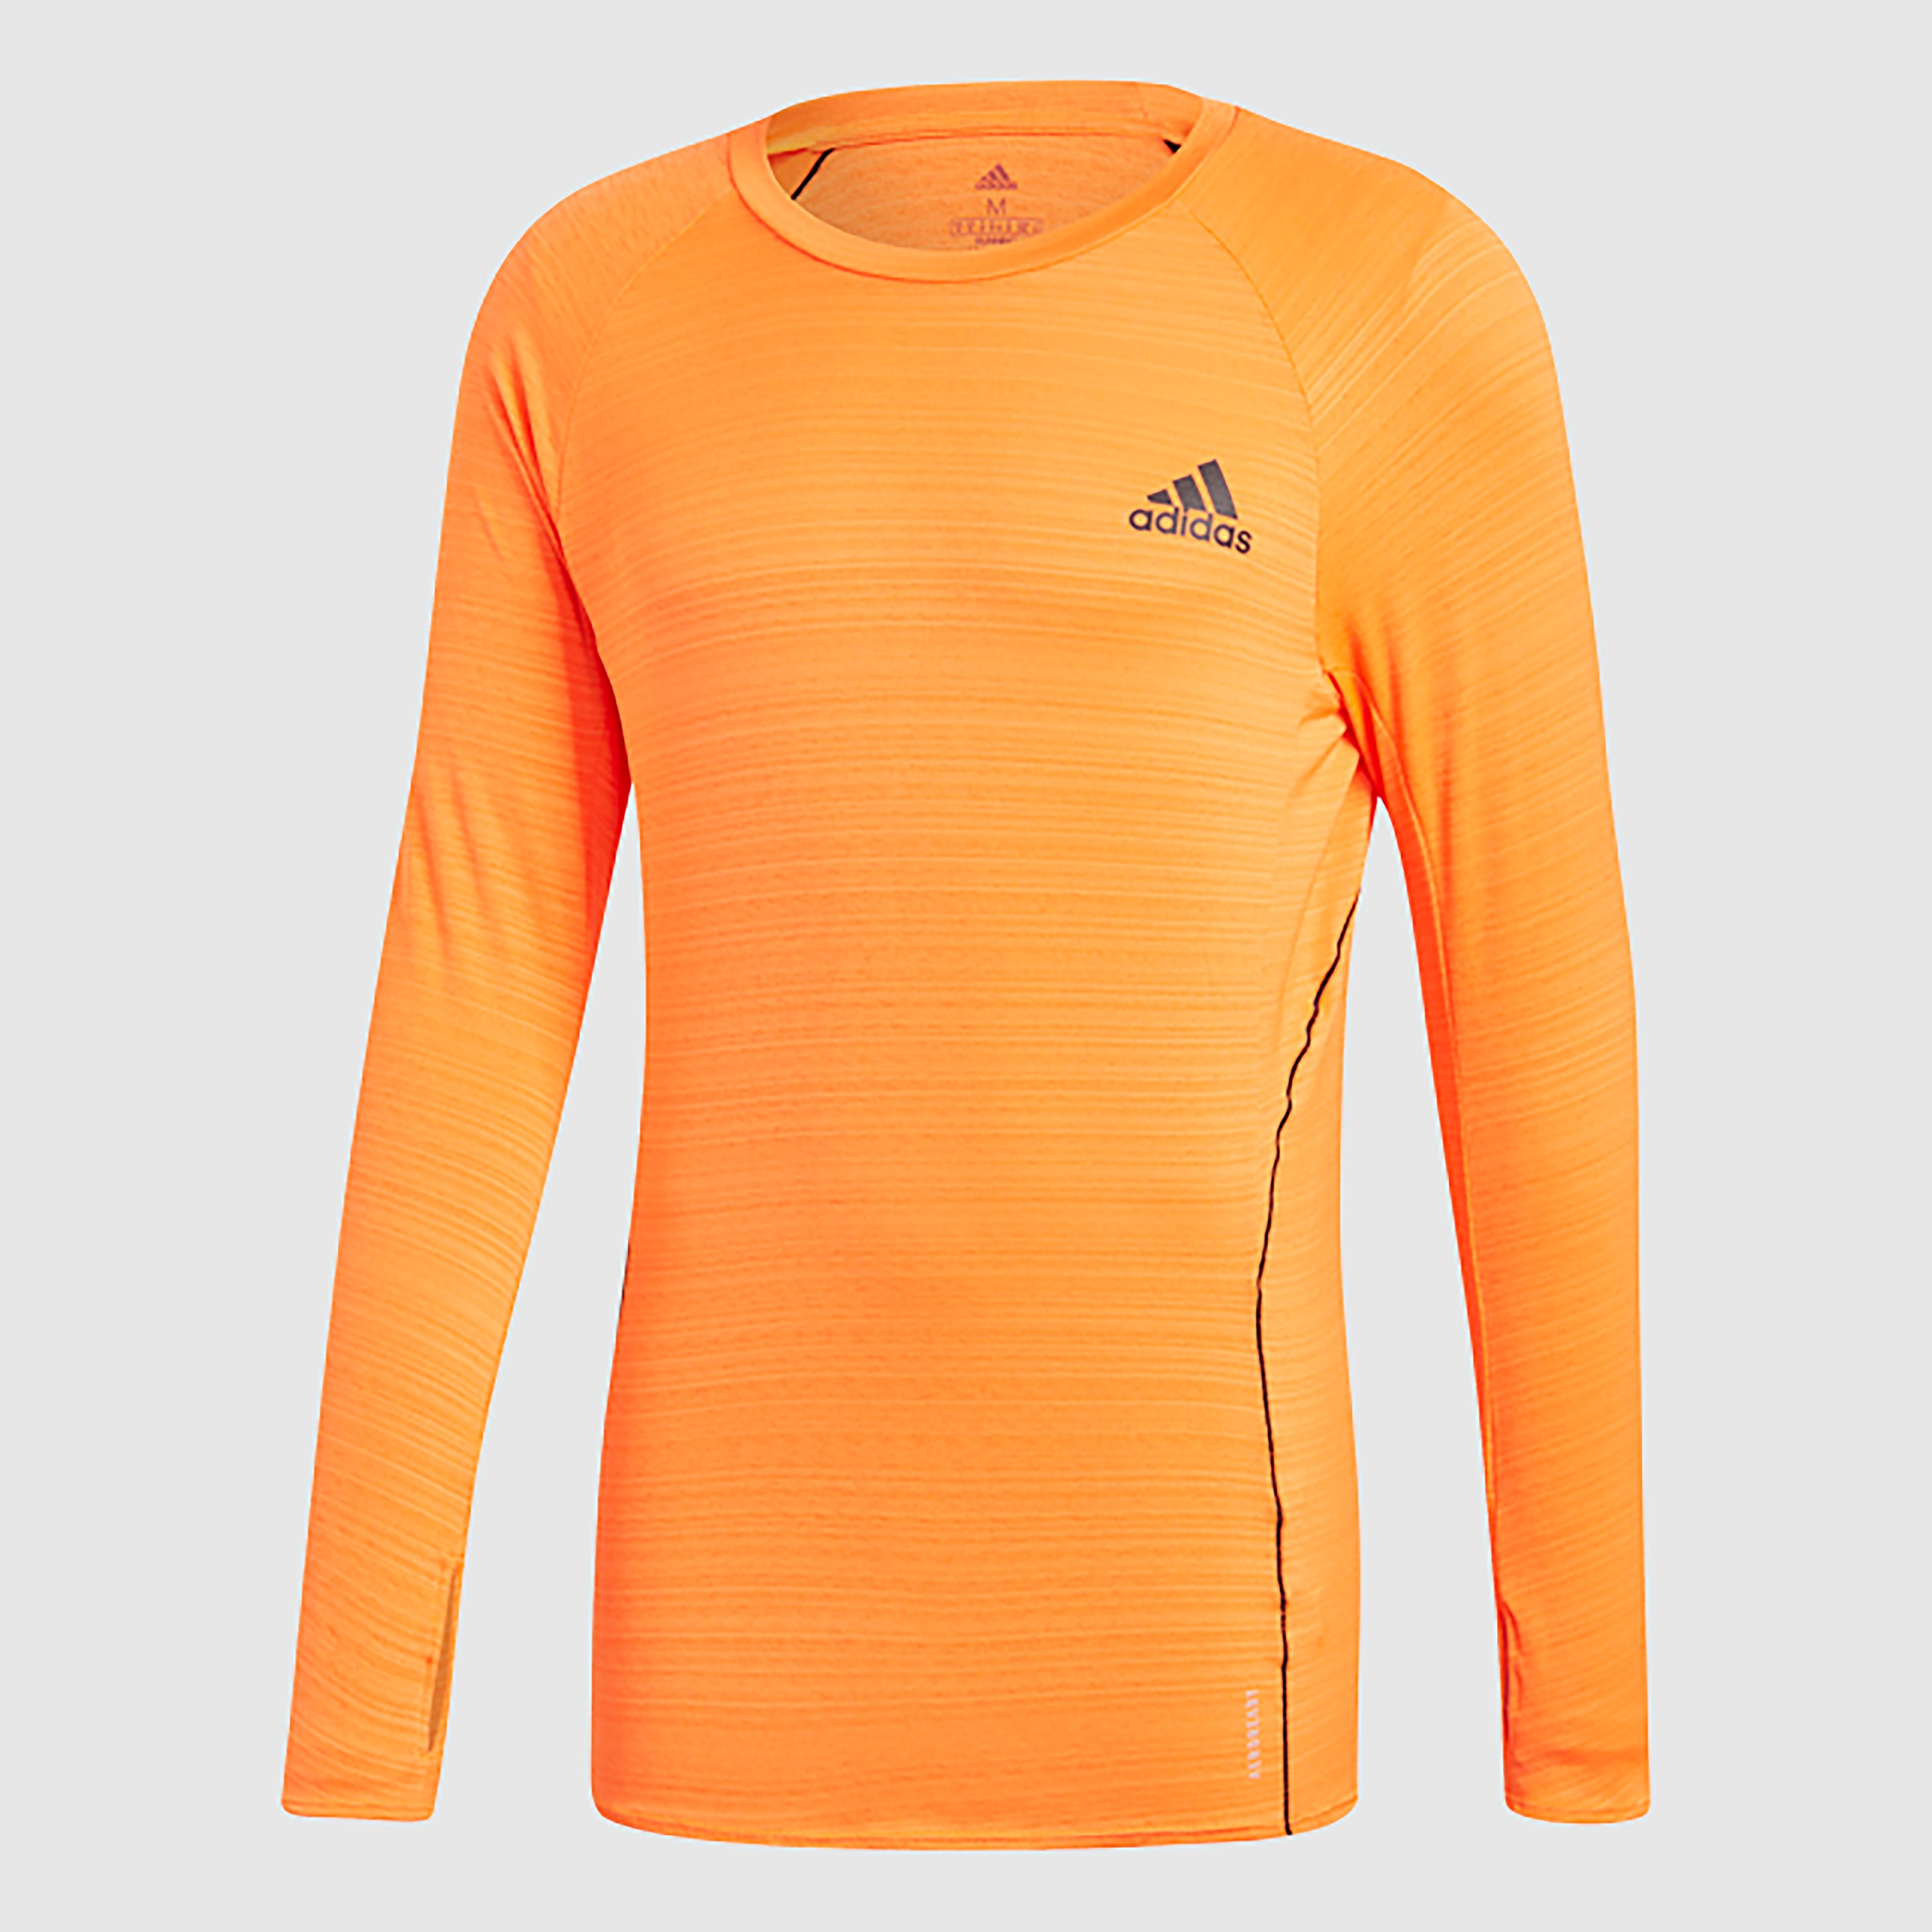 adidas Adi runner hardlooptop oranje heren Heren